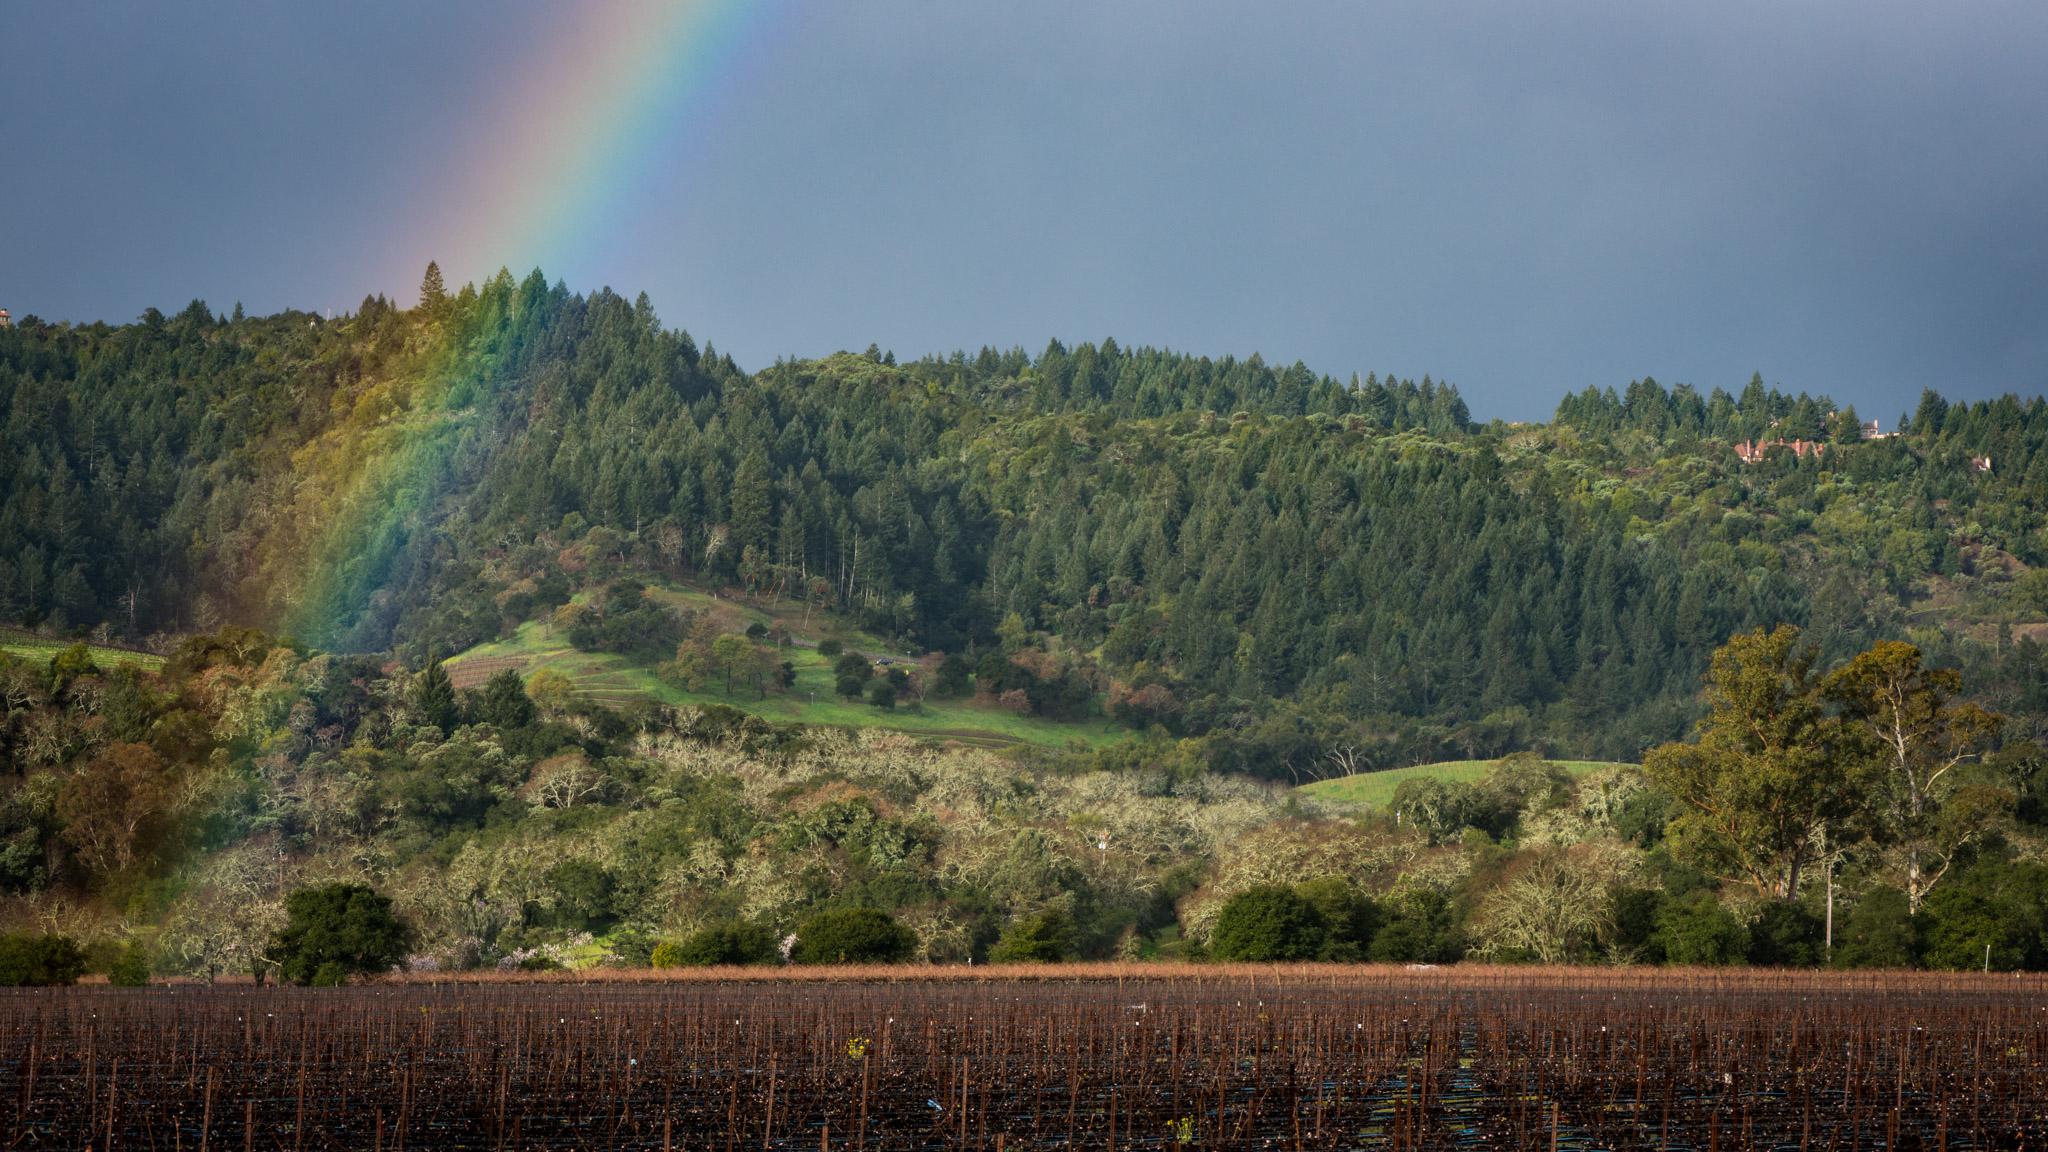 California : Napa Valley : After the rain